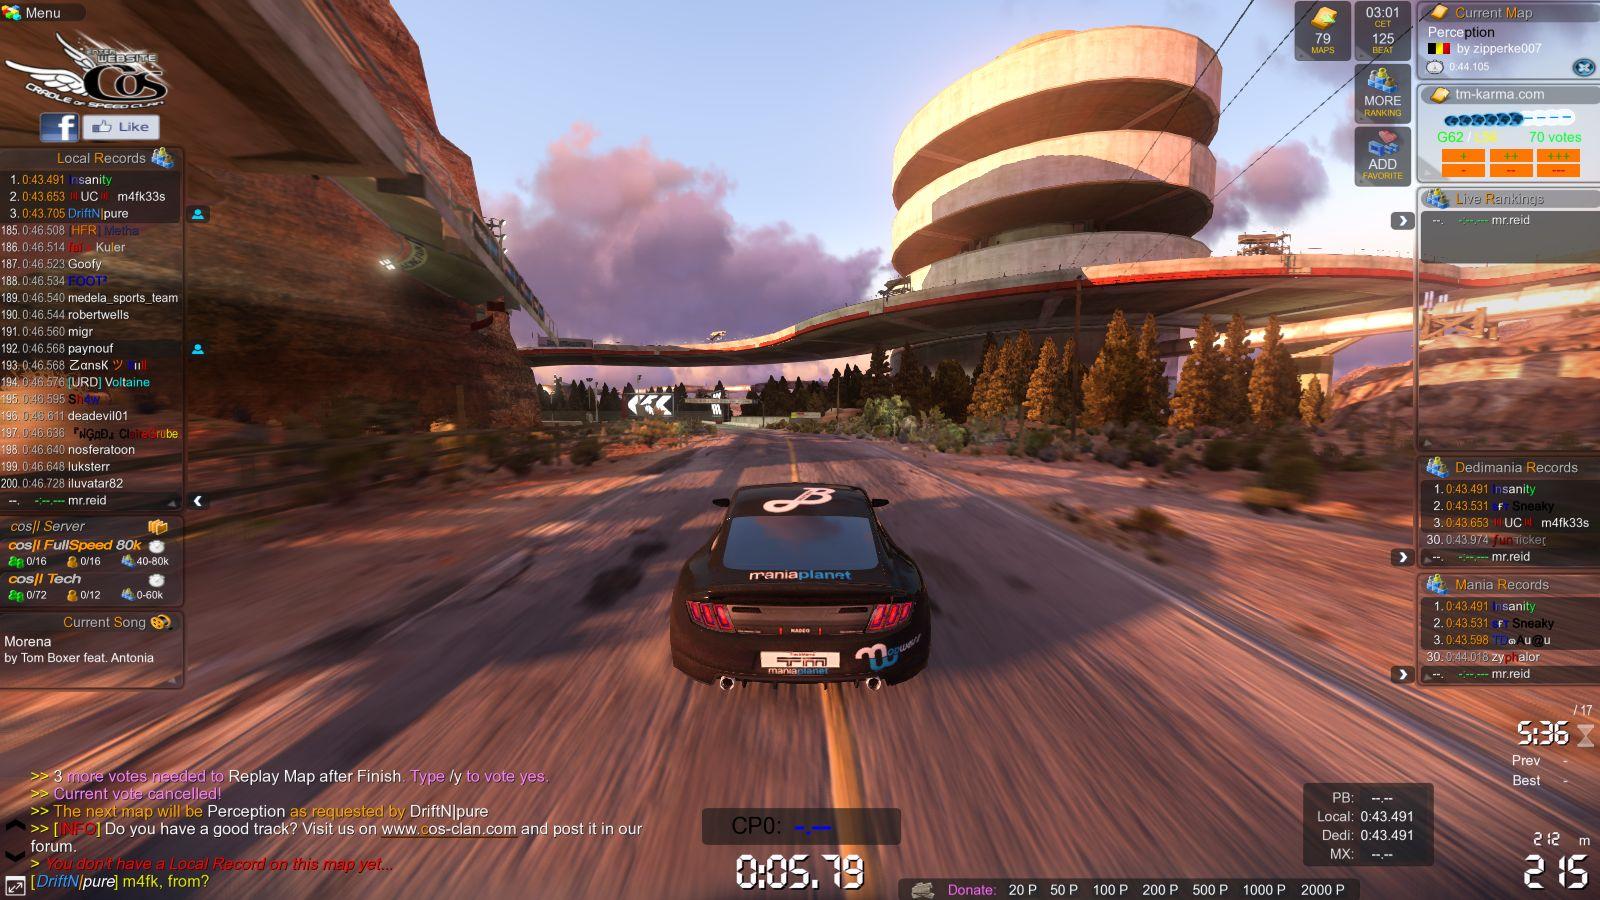 Track 2 game online online casino hiring quezon city